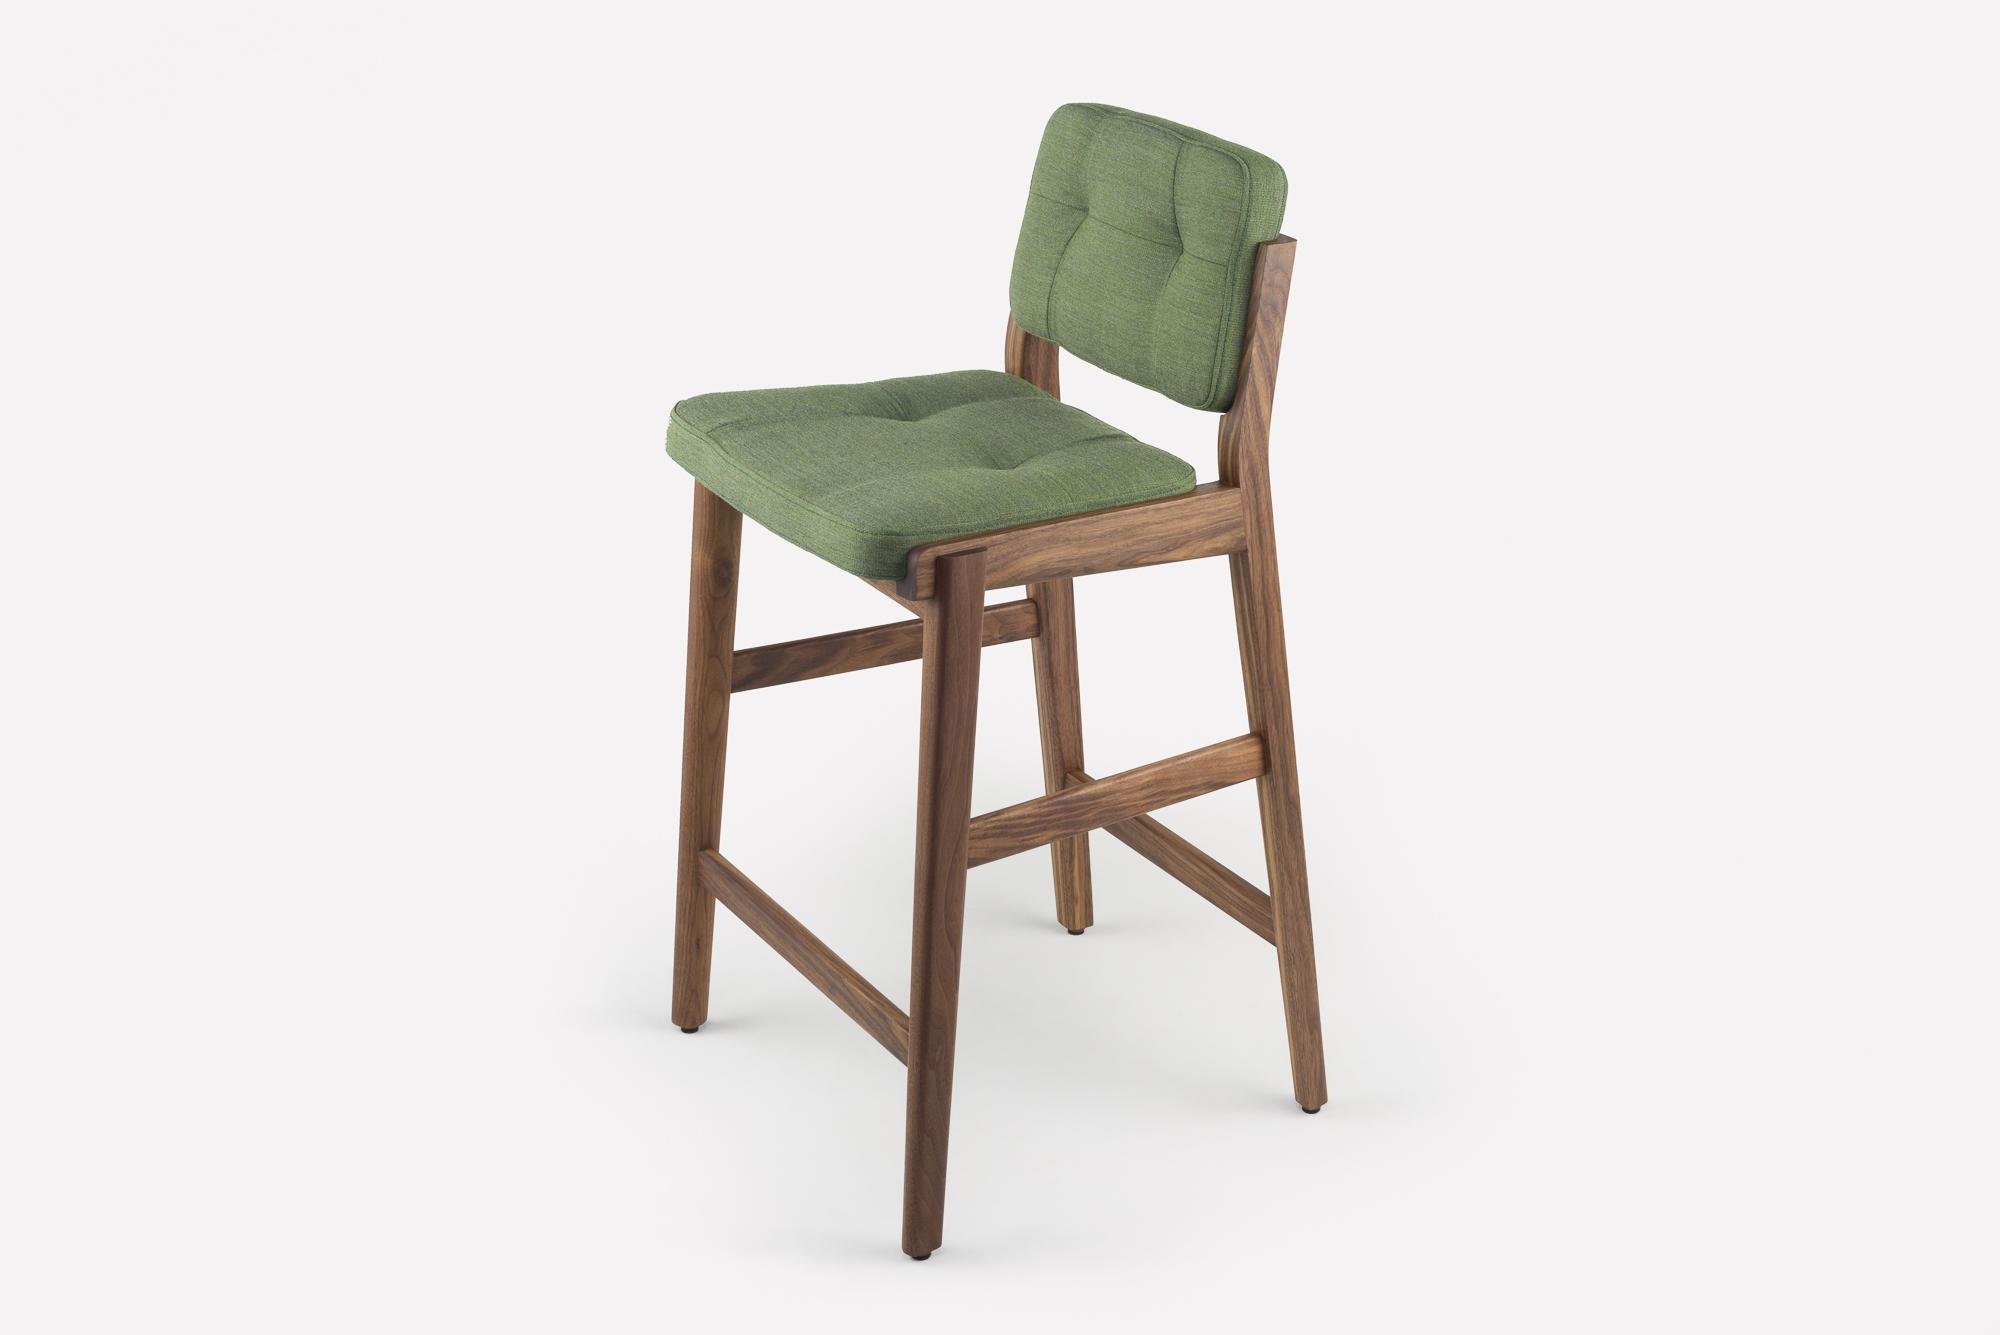 Capo Bar Stool from Neri & Hu for DeLaEspada 780WT stool